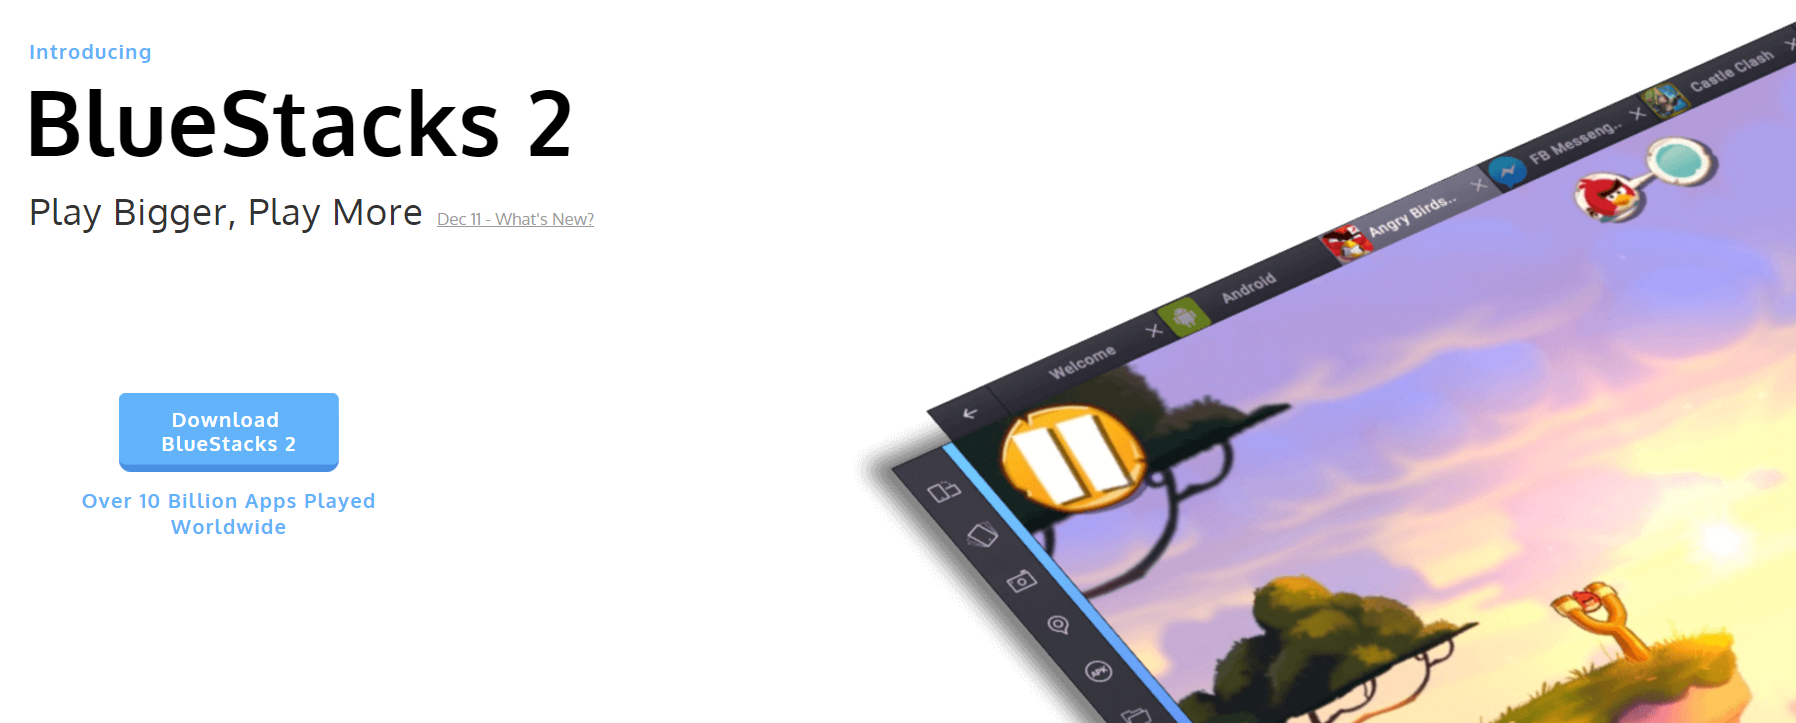 Kik for PC Windows 7 / 8 / 8 1